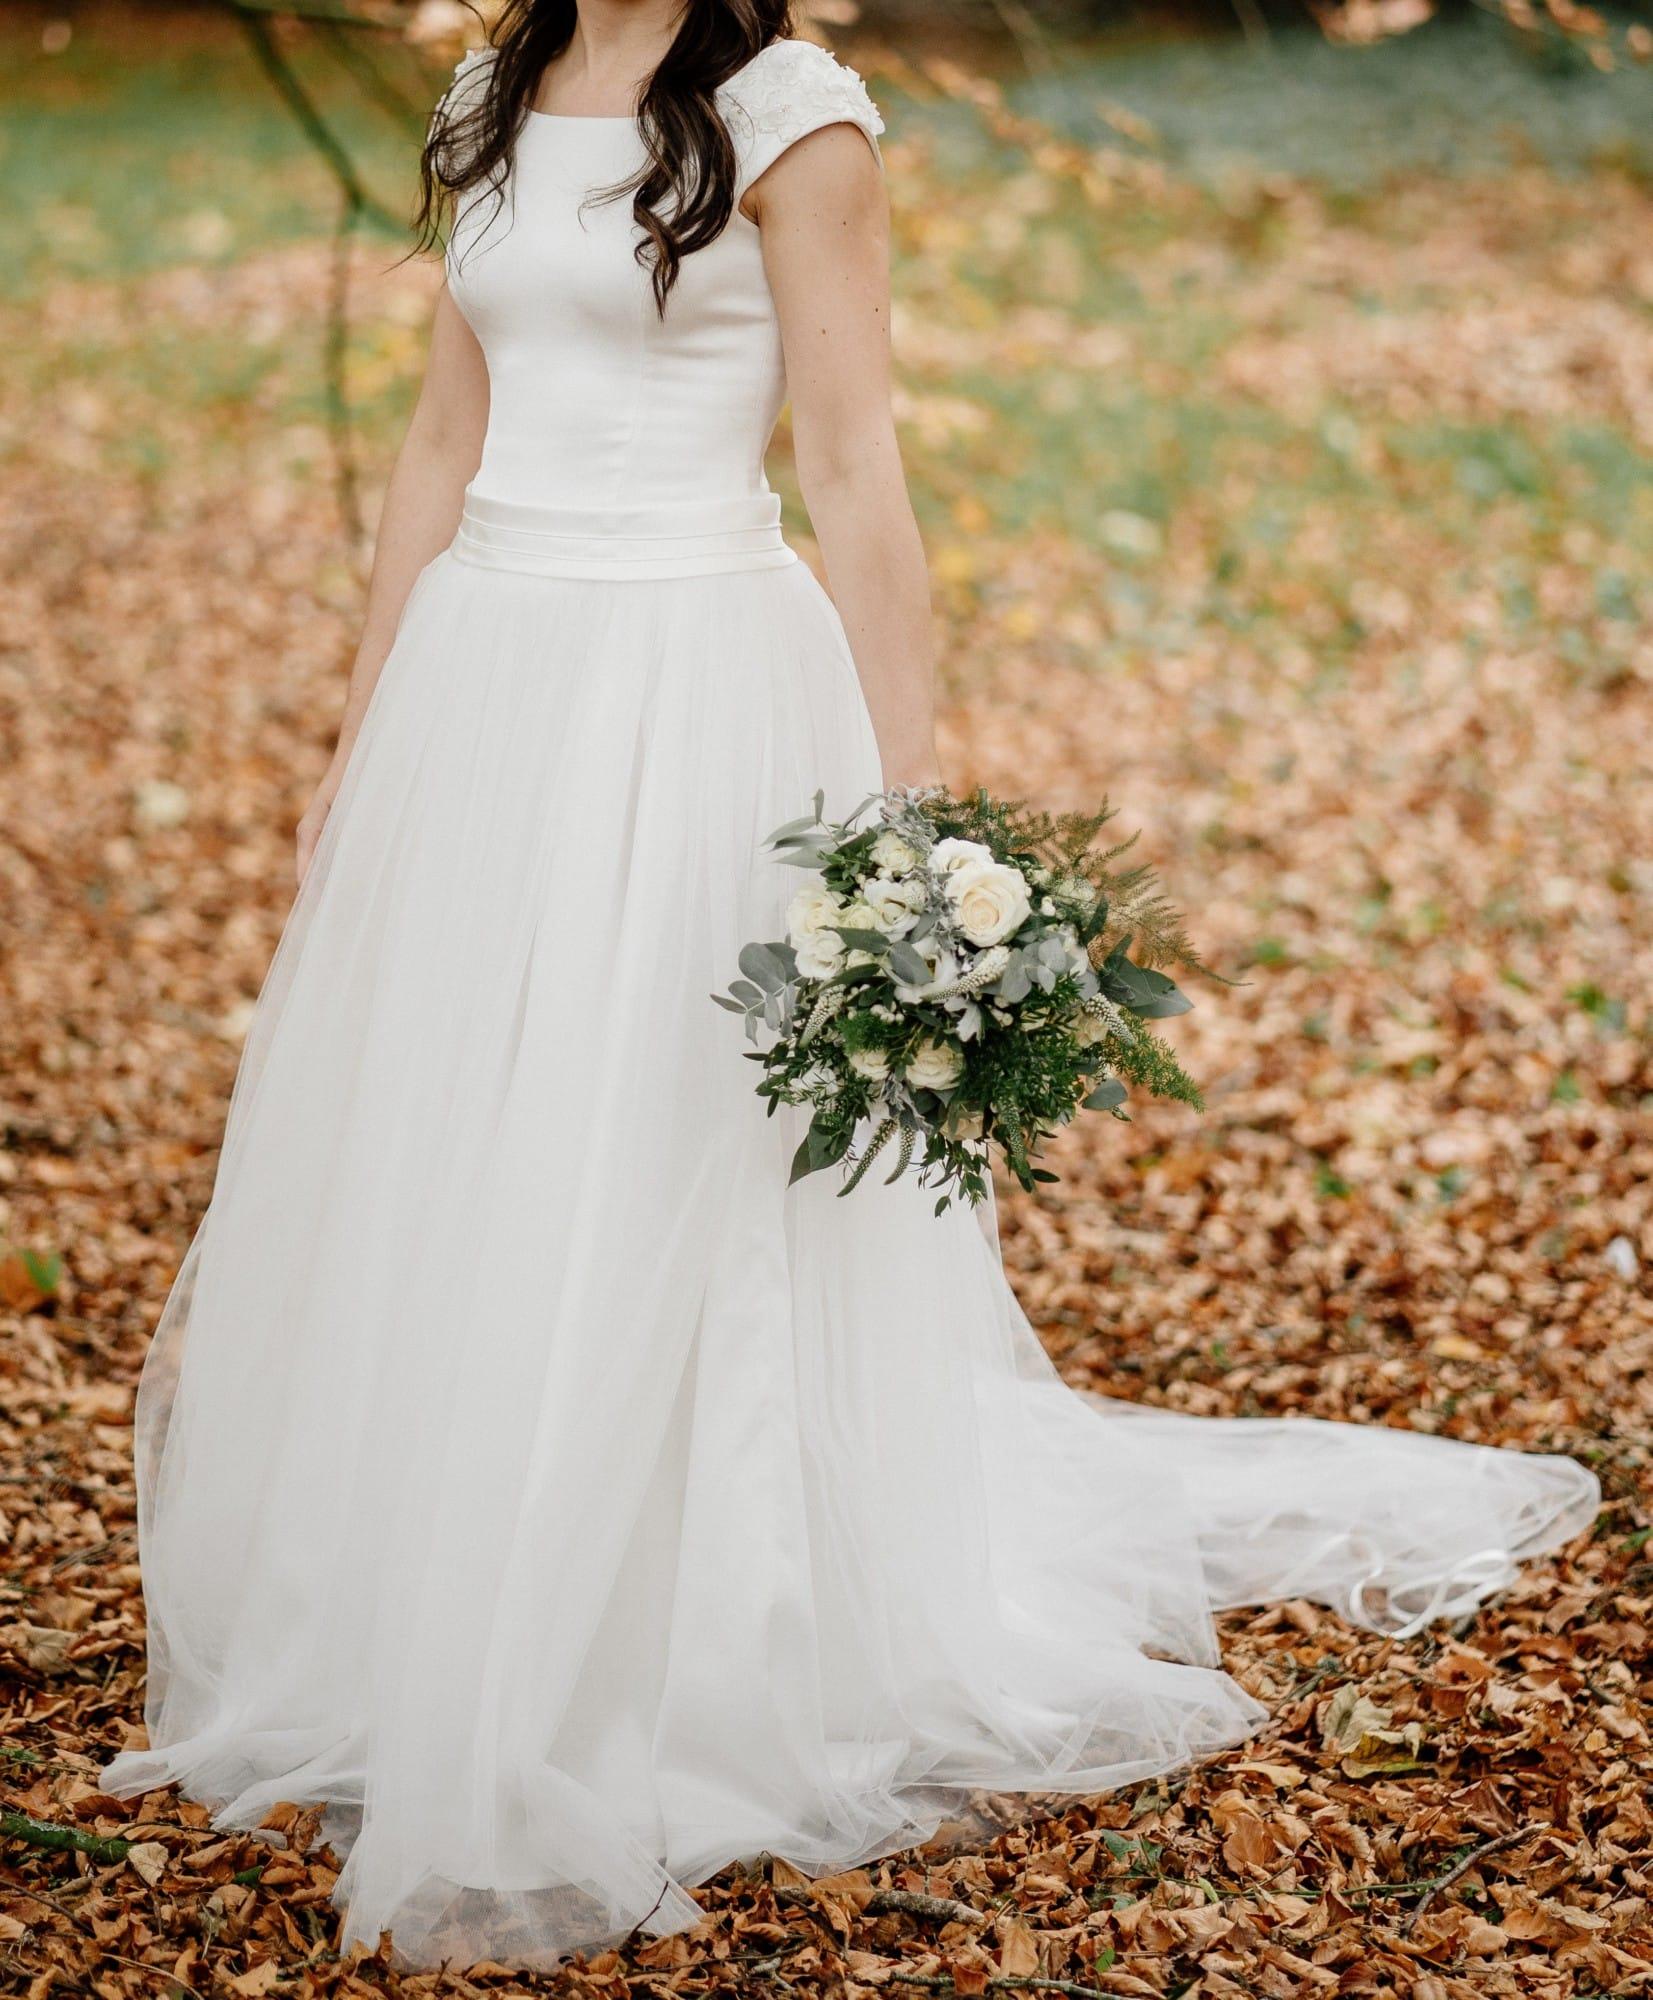 Vintage Wedding Dresses Dublin: Sell My Wedding Dress Online